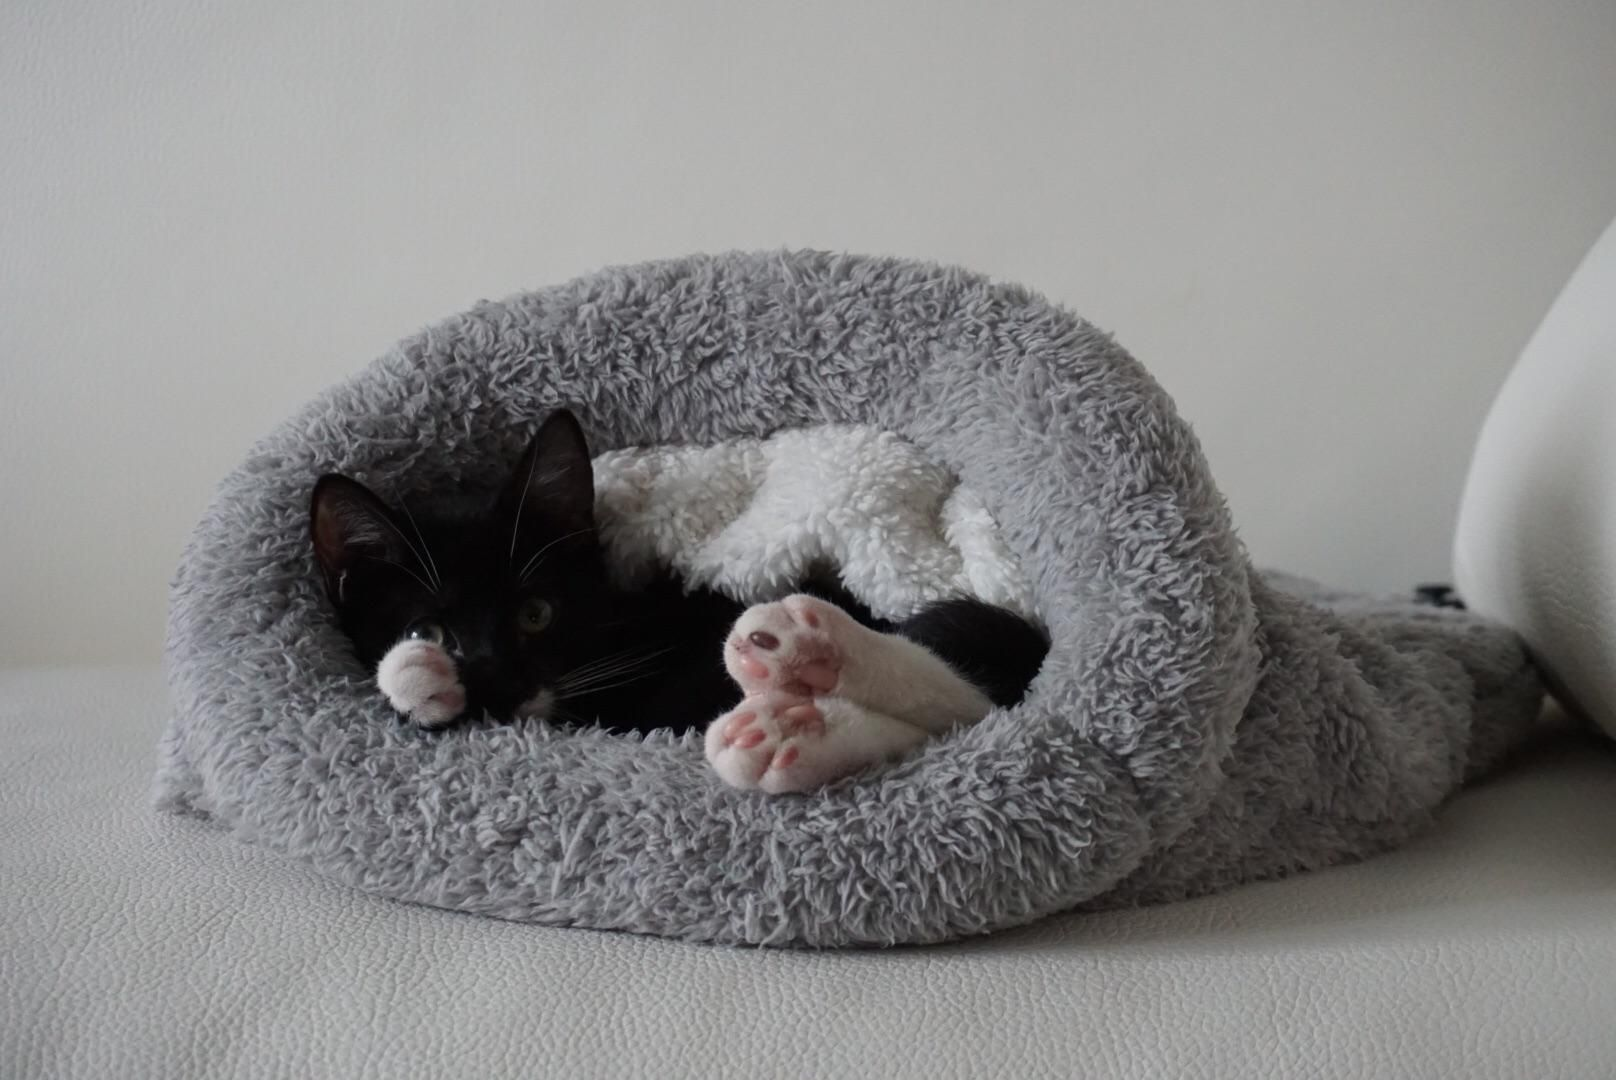 Pin By Meowmoe On Cute Cat Cute Cat Kittens Cutest Jersey Girl